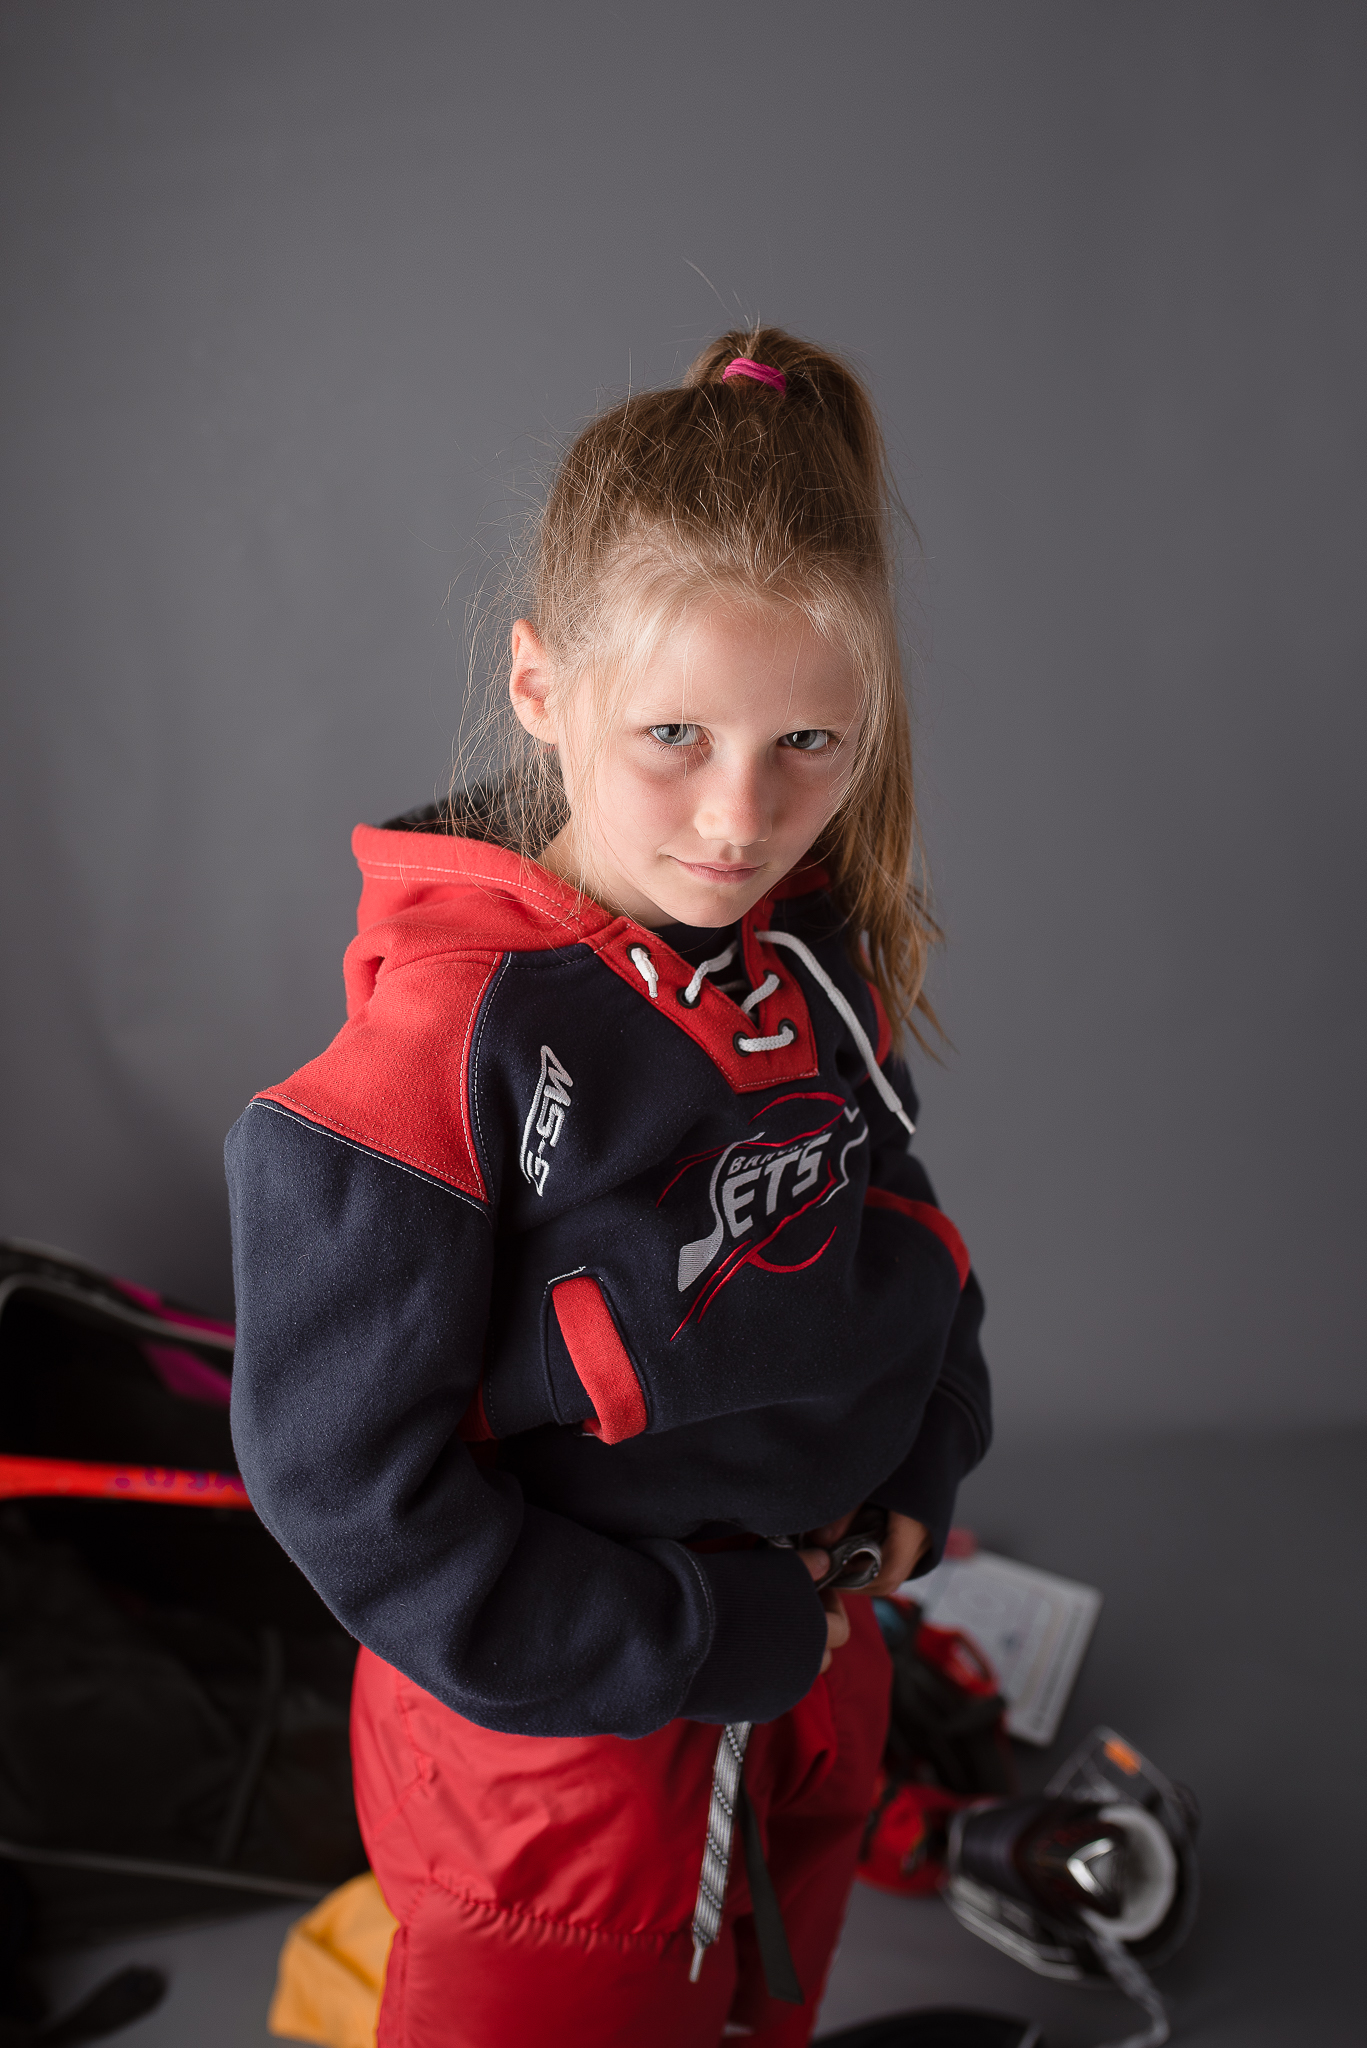 Naomi Lucienne Peterborough Photography Portrait Photography Children Photography Family Photography-18.jpg